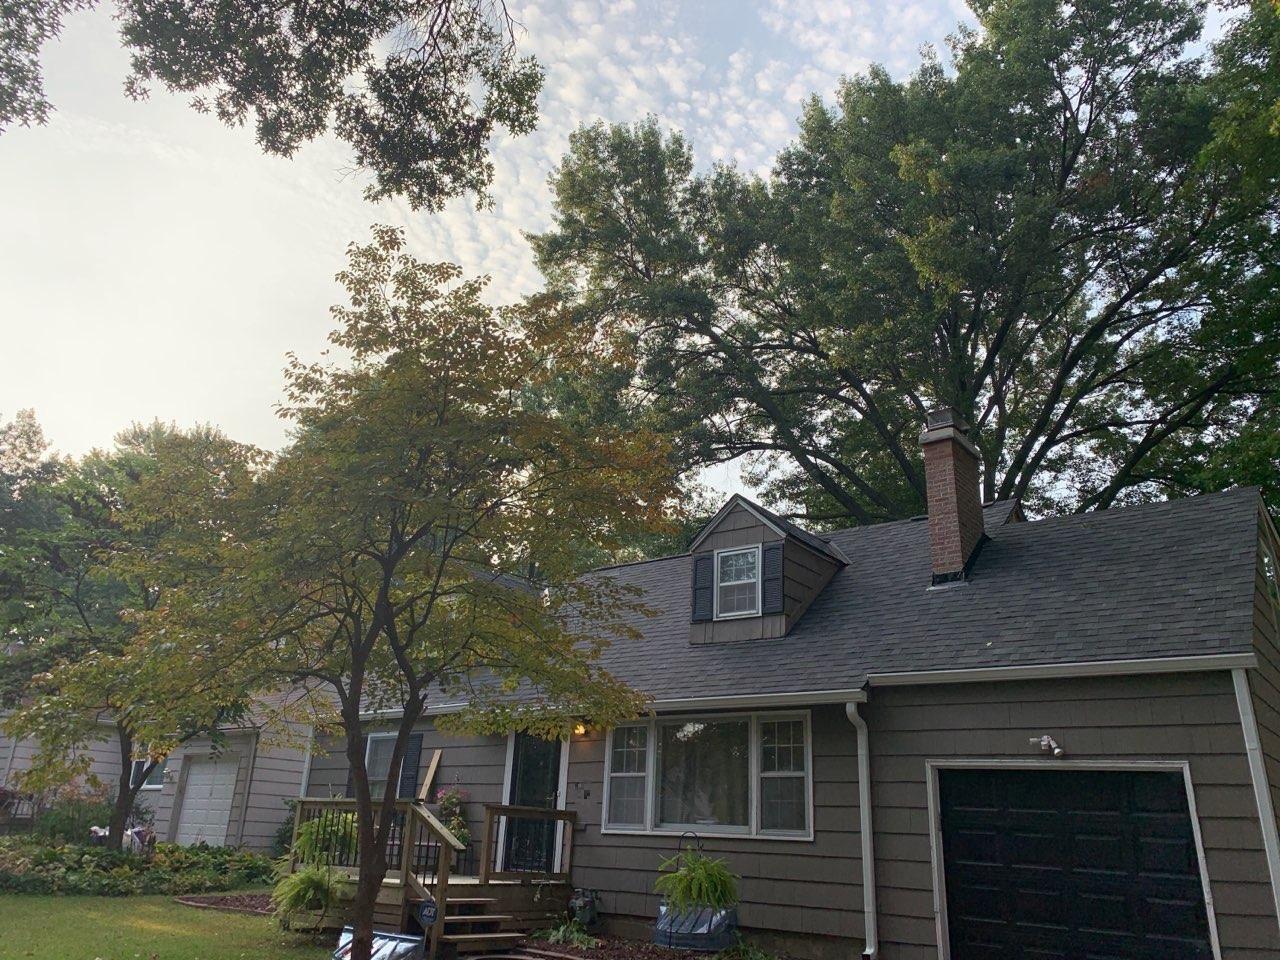 Buck Roofing - Kansas & Missouri - Residential Roofing - Malarkey Legacy - Midnight Black